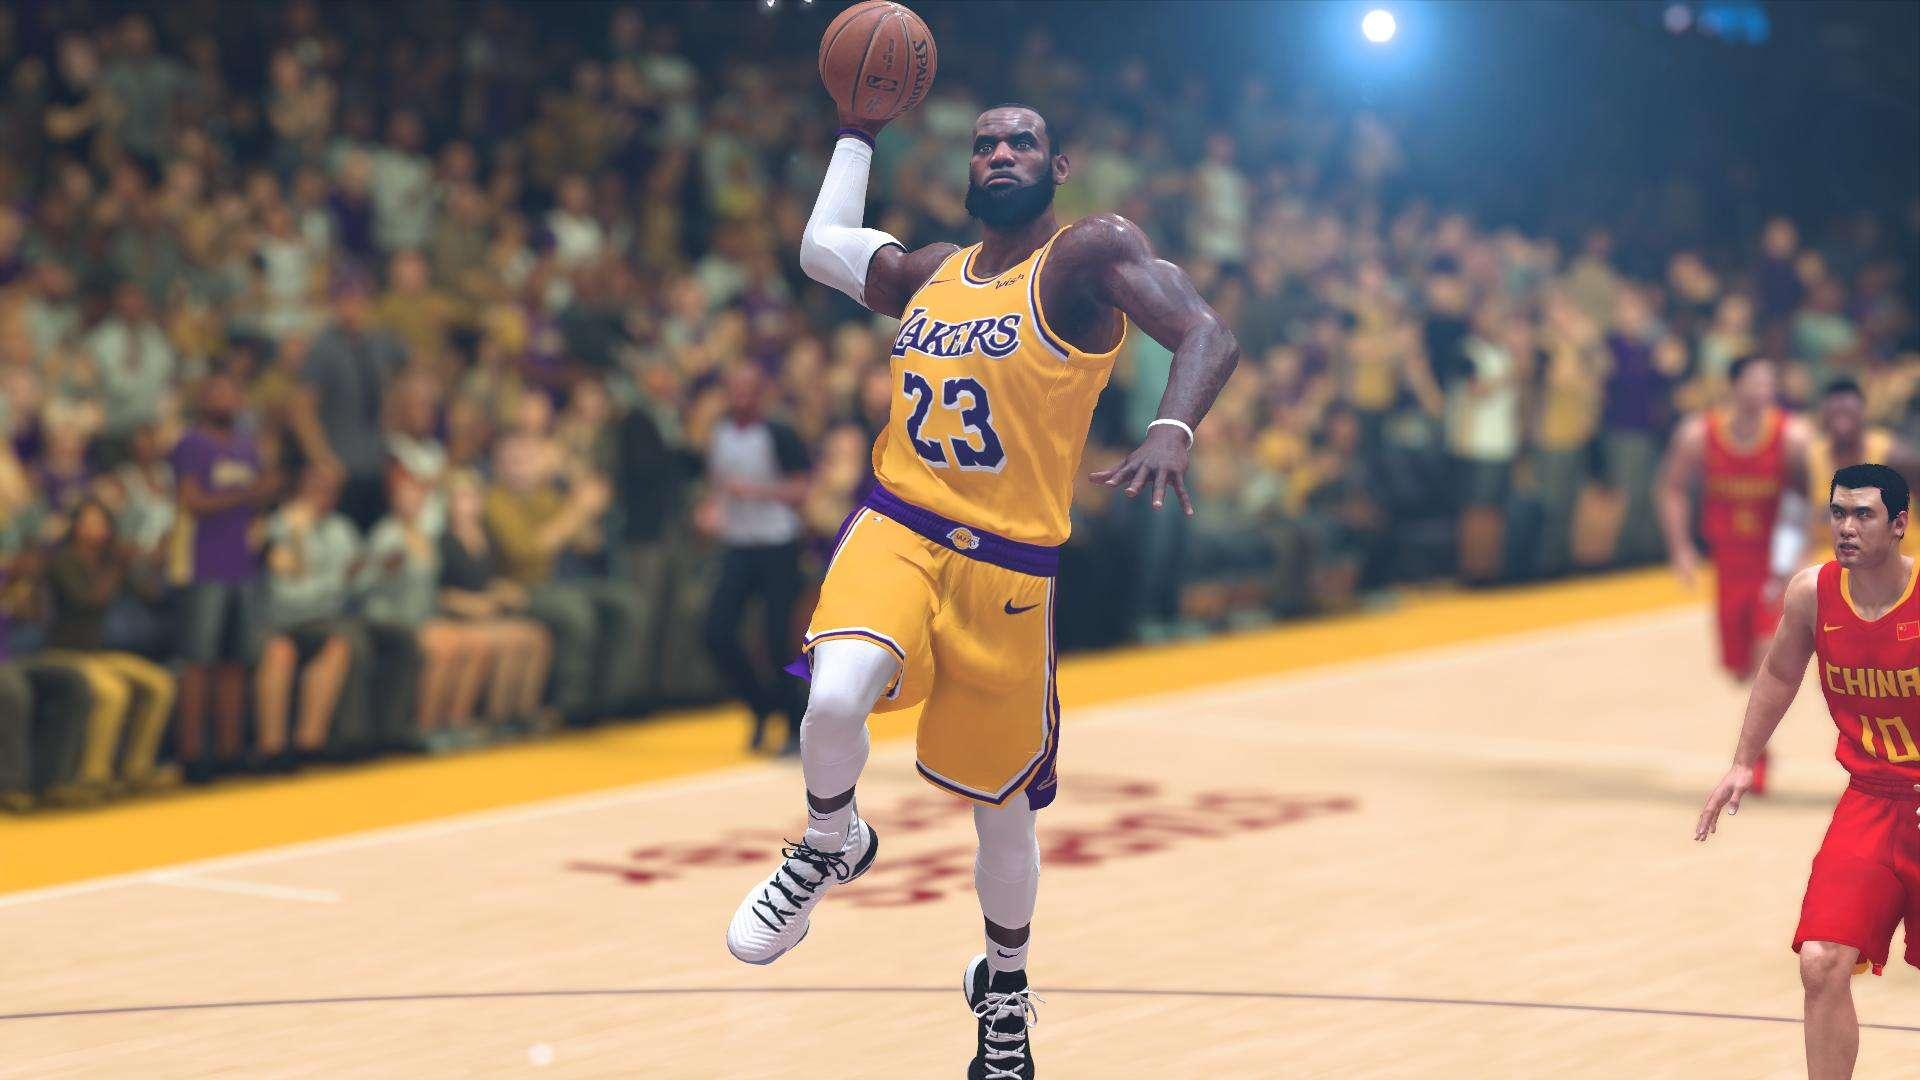 NBA2k20安卓版第8张预览图